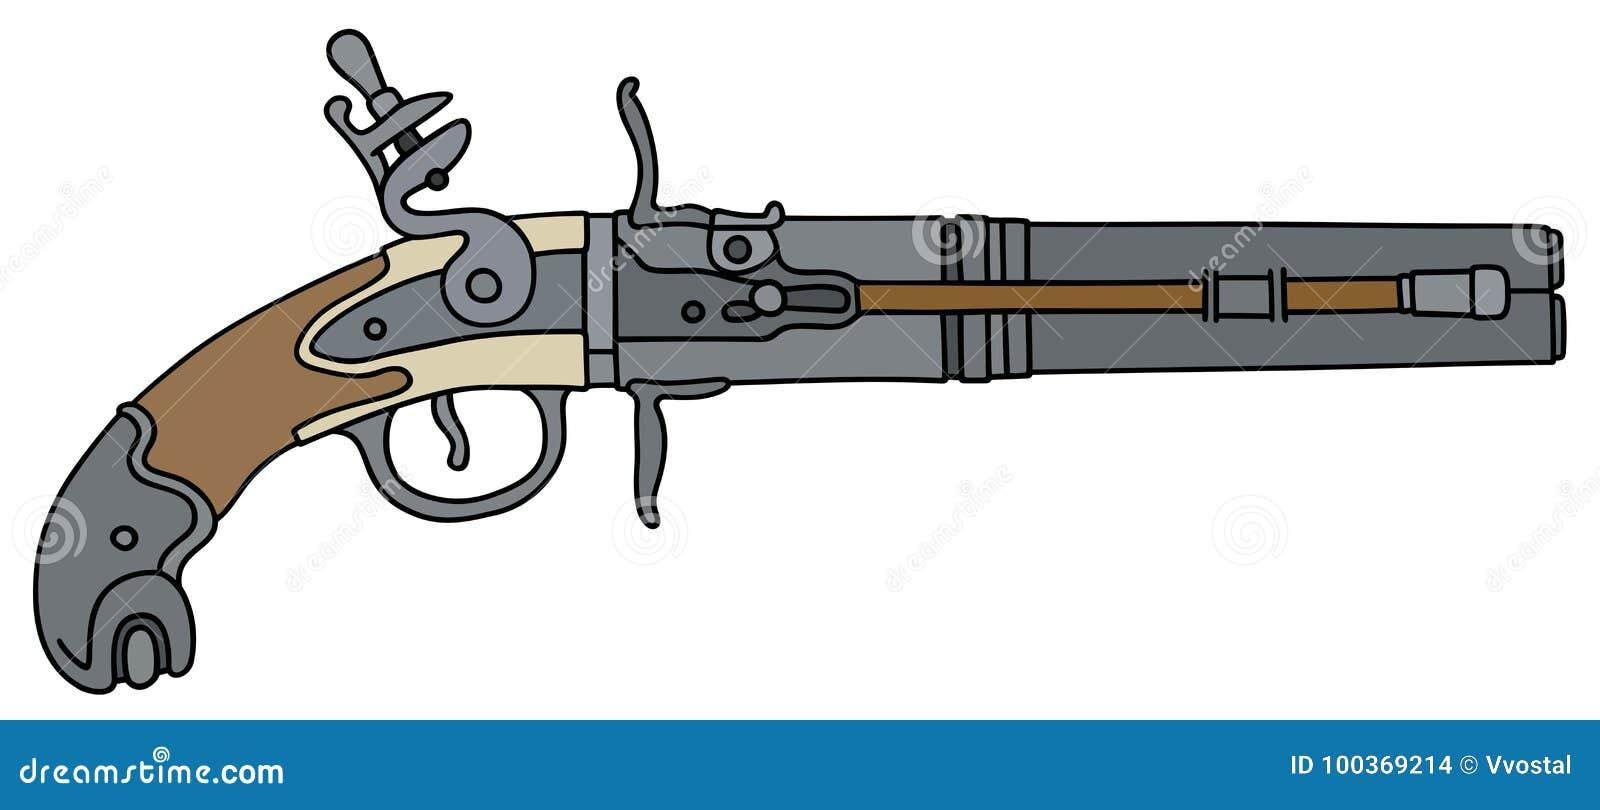 Vintage percussion handgun stock vector  Illustration of drawing